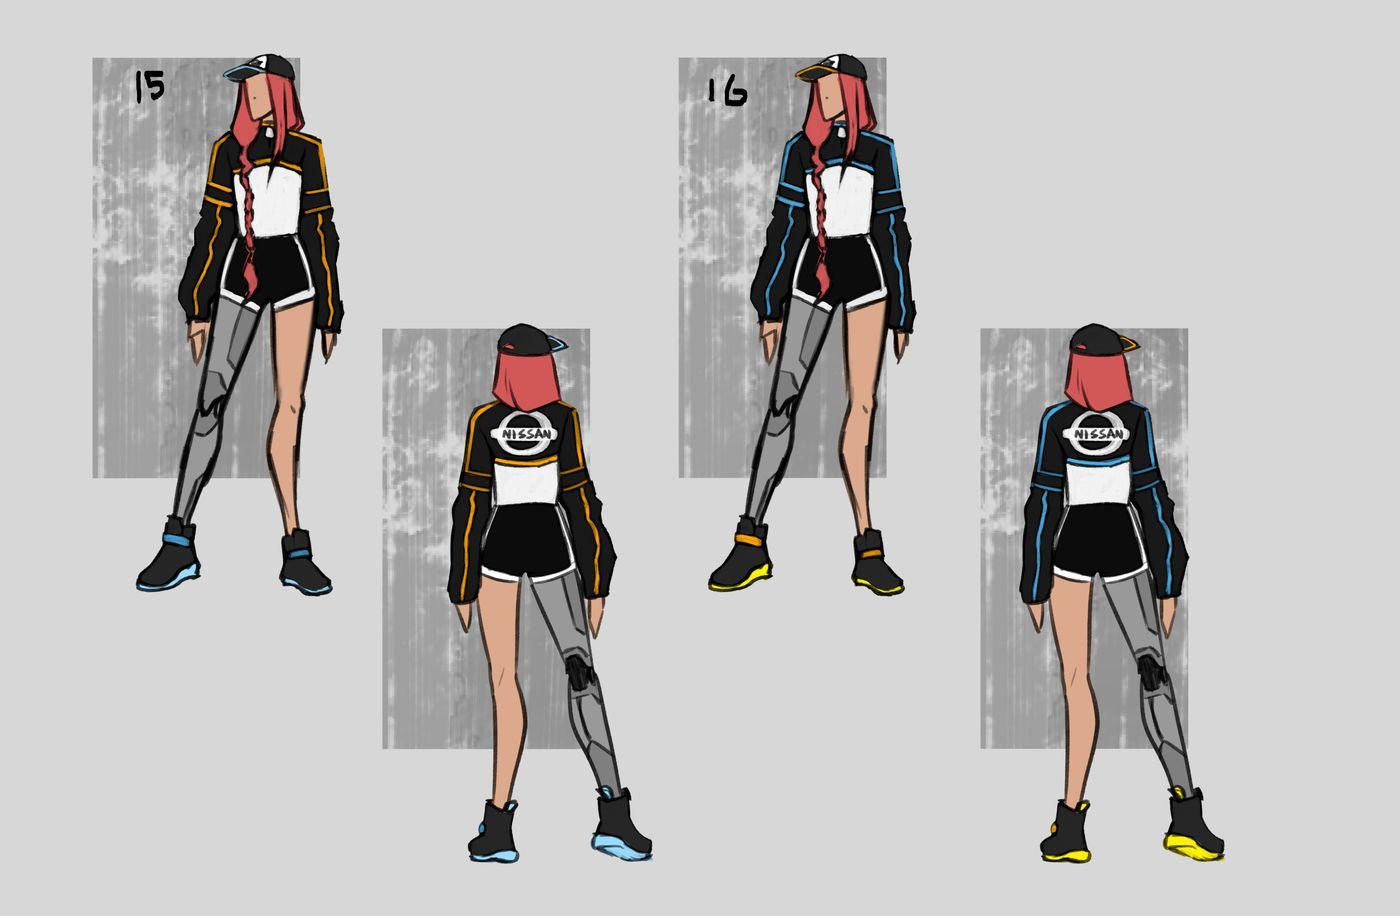 Steer Jasmine %20 Scme3420 Rookies %20 Character Design Colour Passes08 Jasminesteer